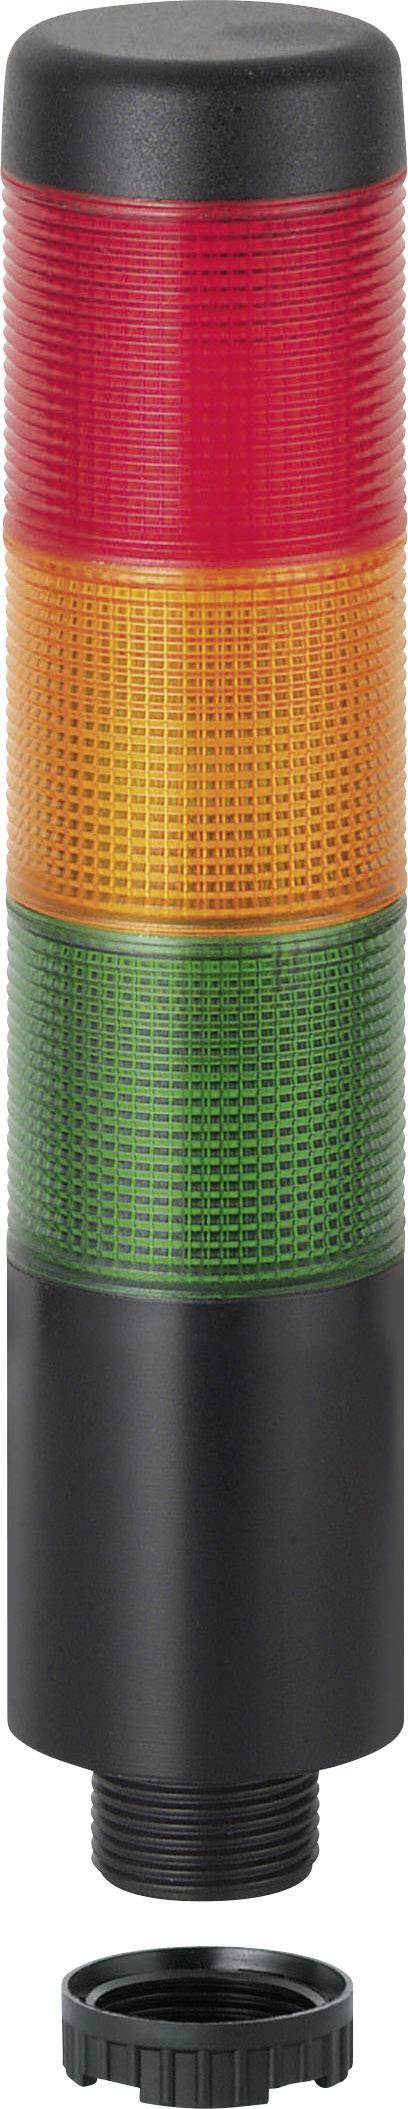 Signalizačný stĺpik LED Werma Signaltechnik WERMA KombiSign 71 698.110.75, 24 V/AC, 24 V/DC, trvalé svetlo, zelená, žltá, červená